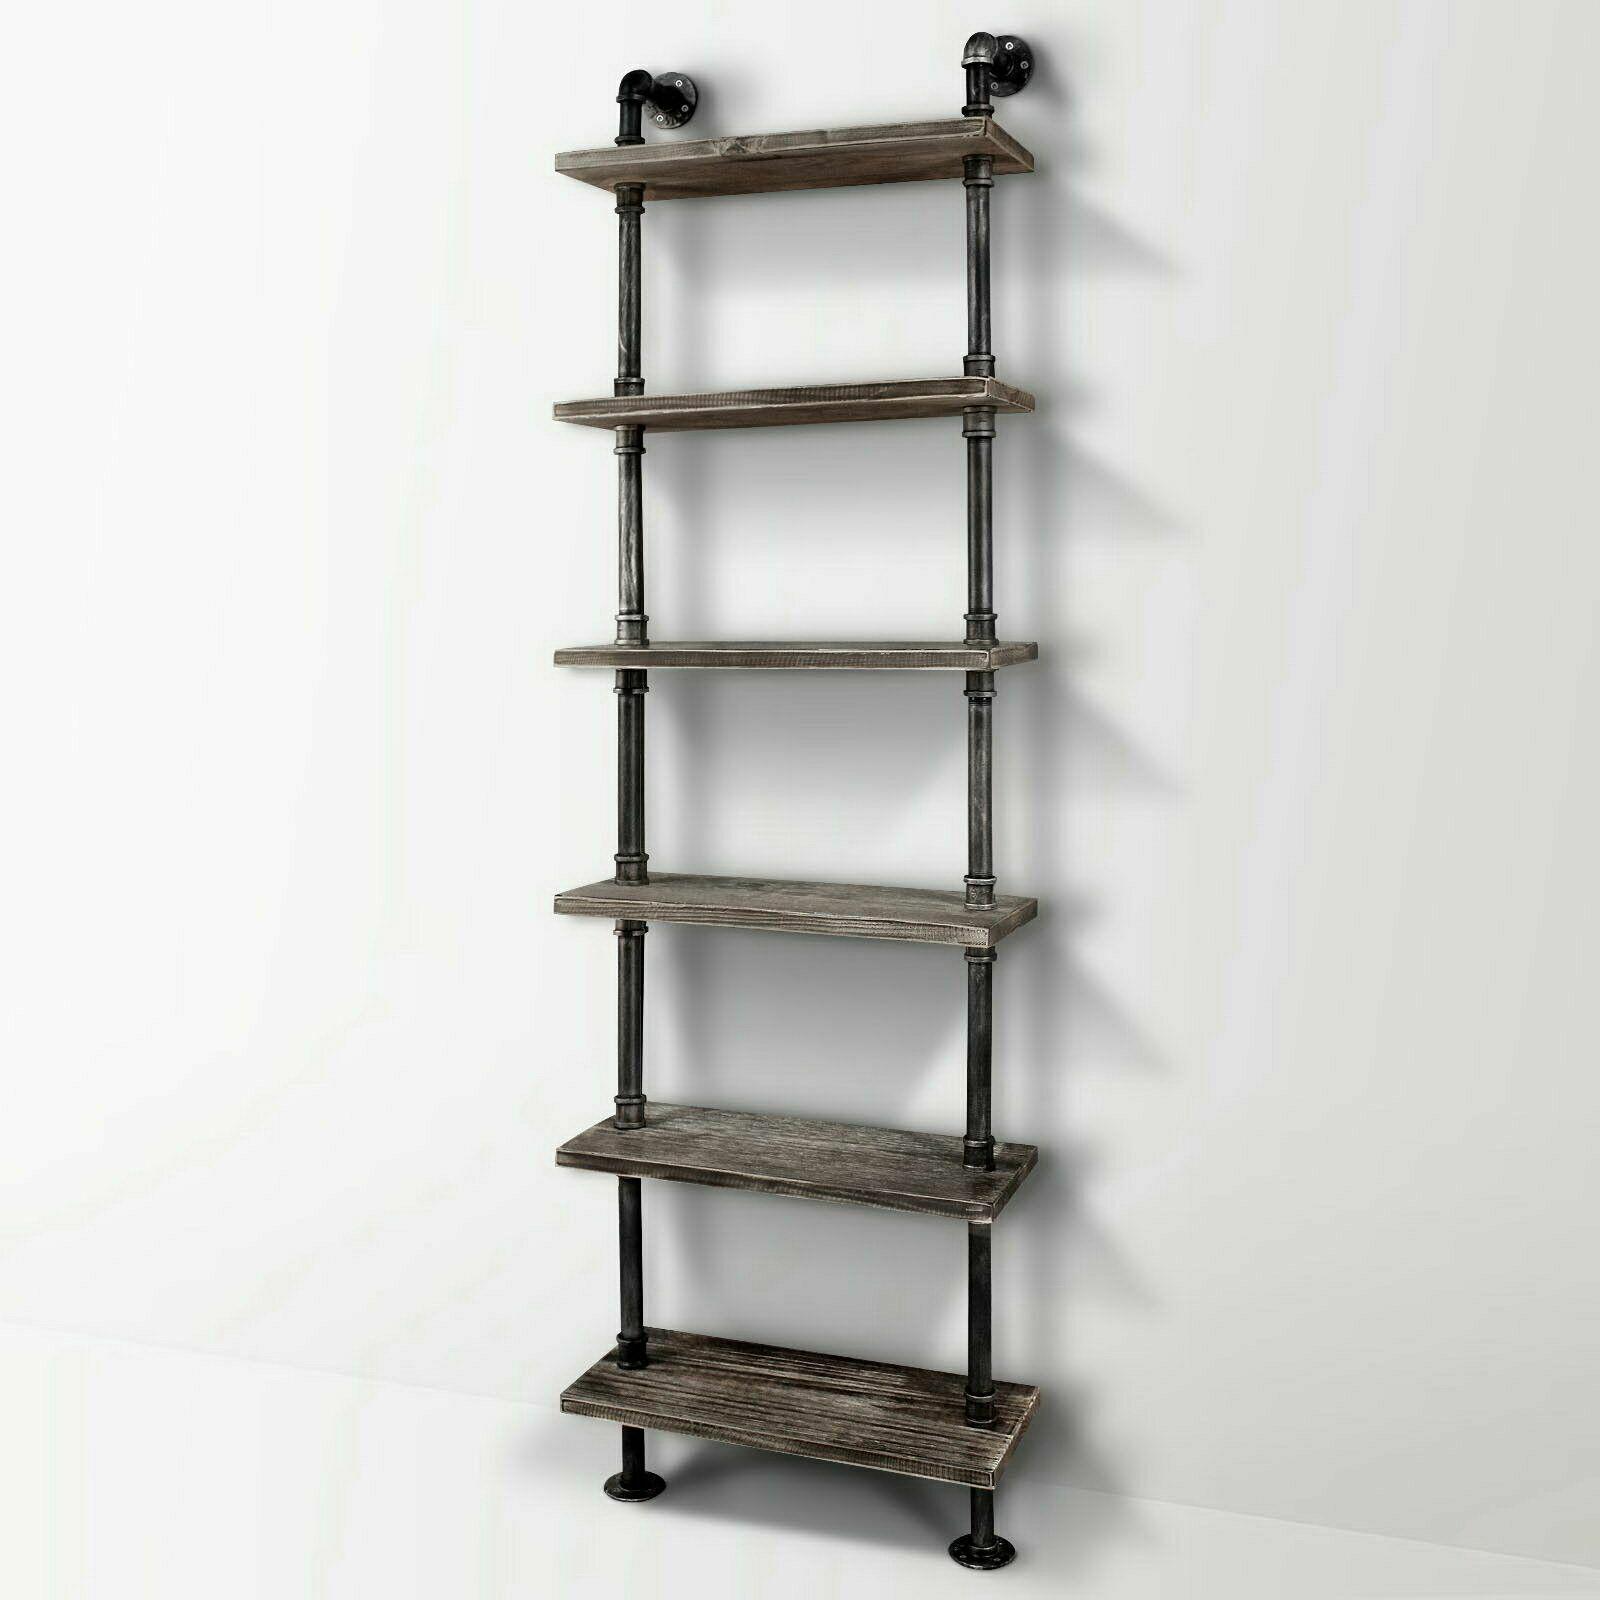 6 Level Rustic Ladder Bookshelf Diy Pipe Display Shelf Cabinet Industrial Wooden Ebay